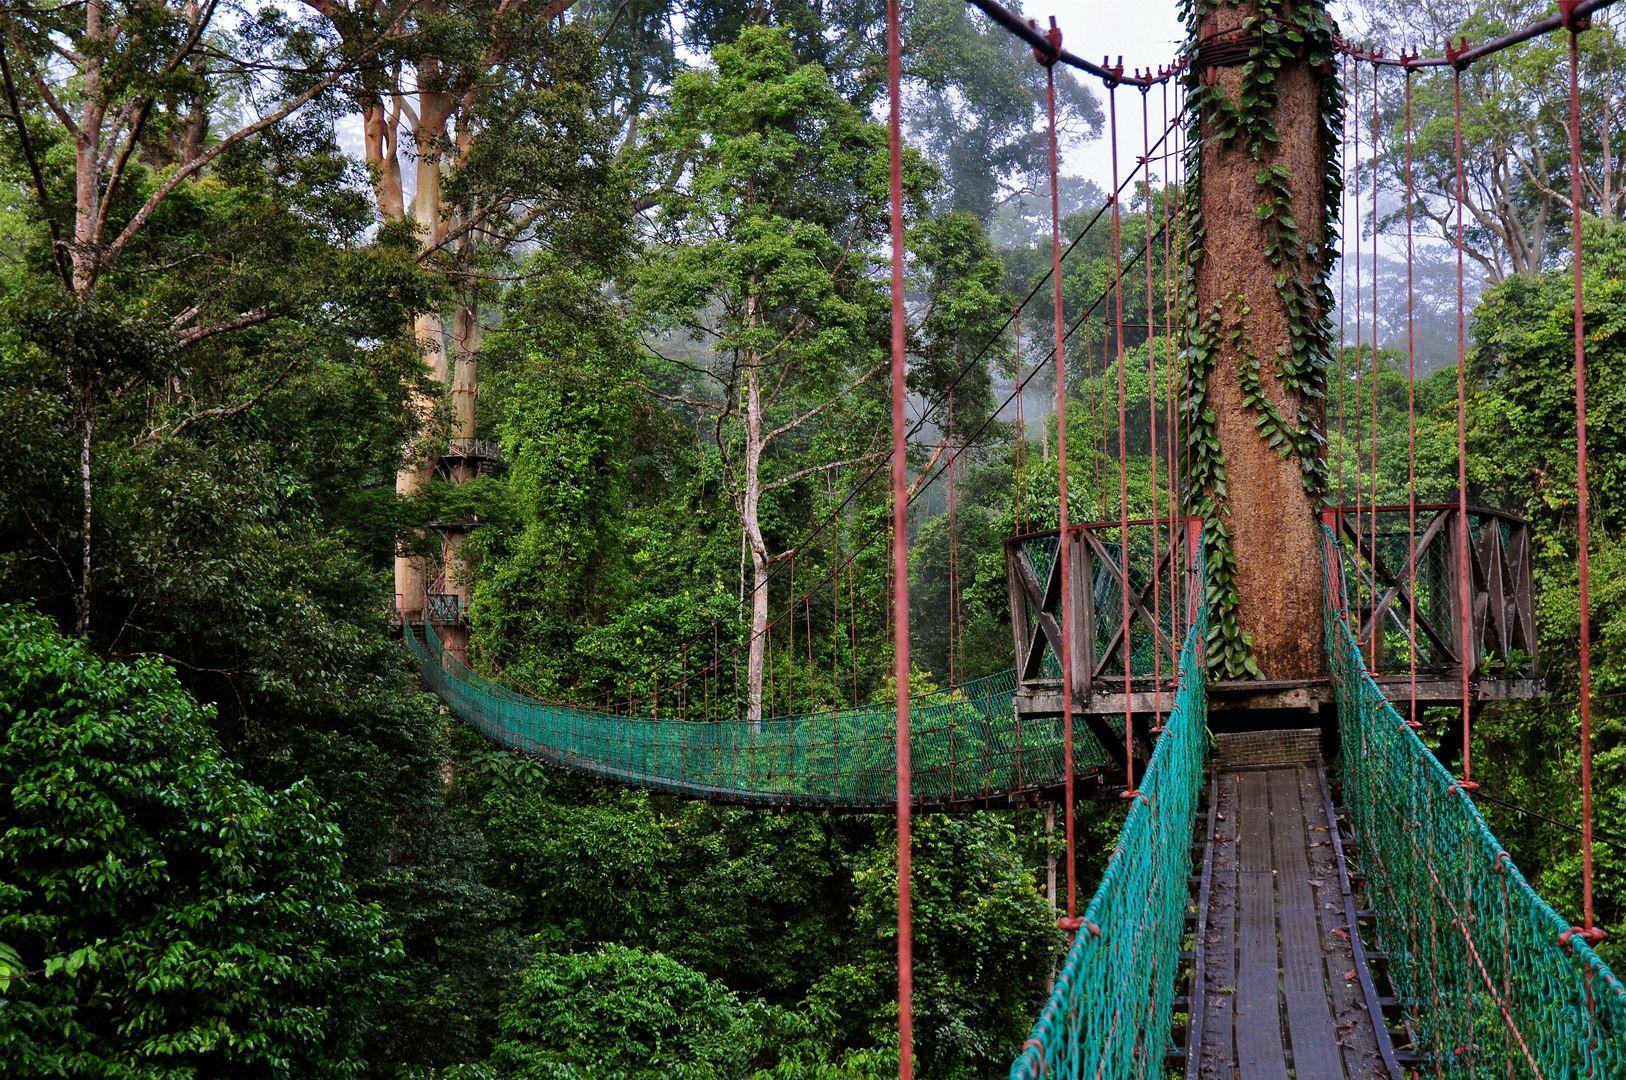 Borneo Rainforest Canopy Walkway in Malaysia & Borneo Rainforest Canopy Walkway in Malaysia | Places Iu0027d Like to ...